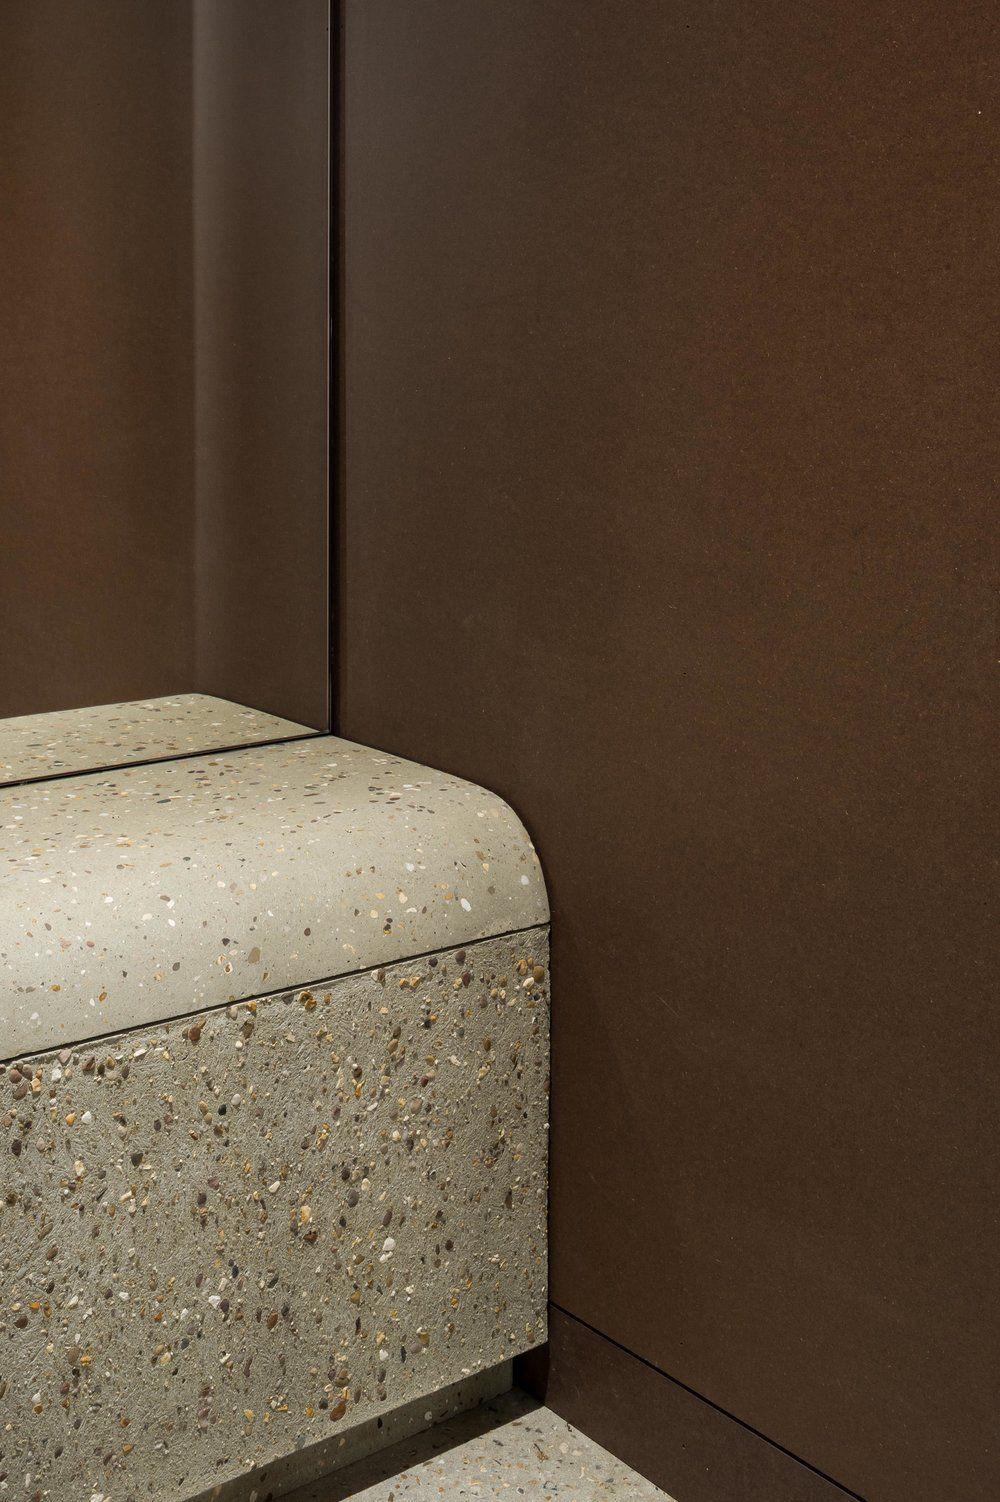 7c88e7aa483 Carhartt WIP King's Cross by Faye Toogood | Public space | Interior ...